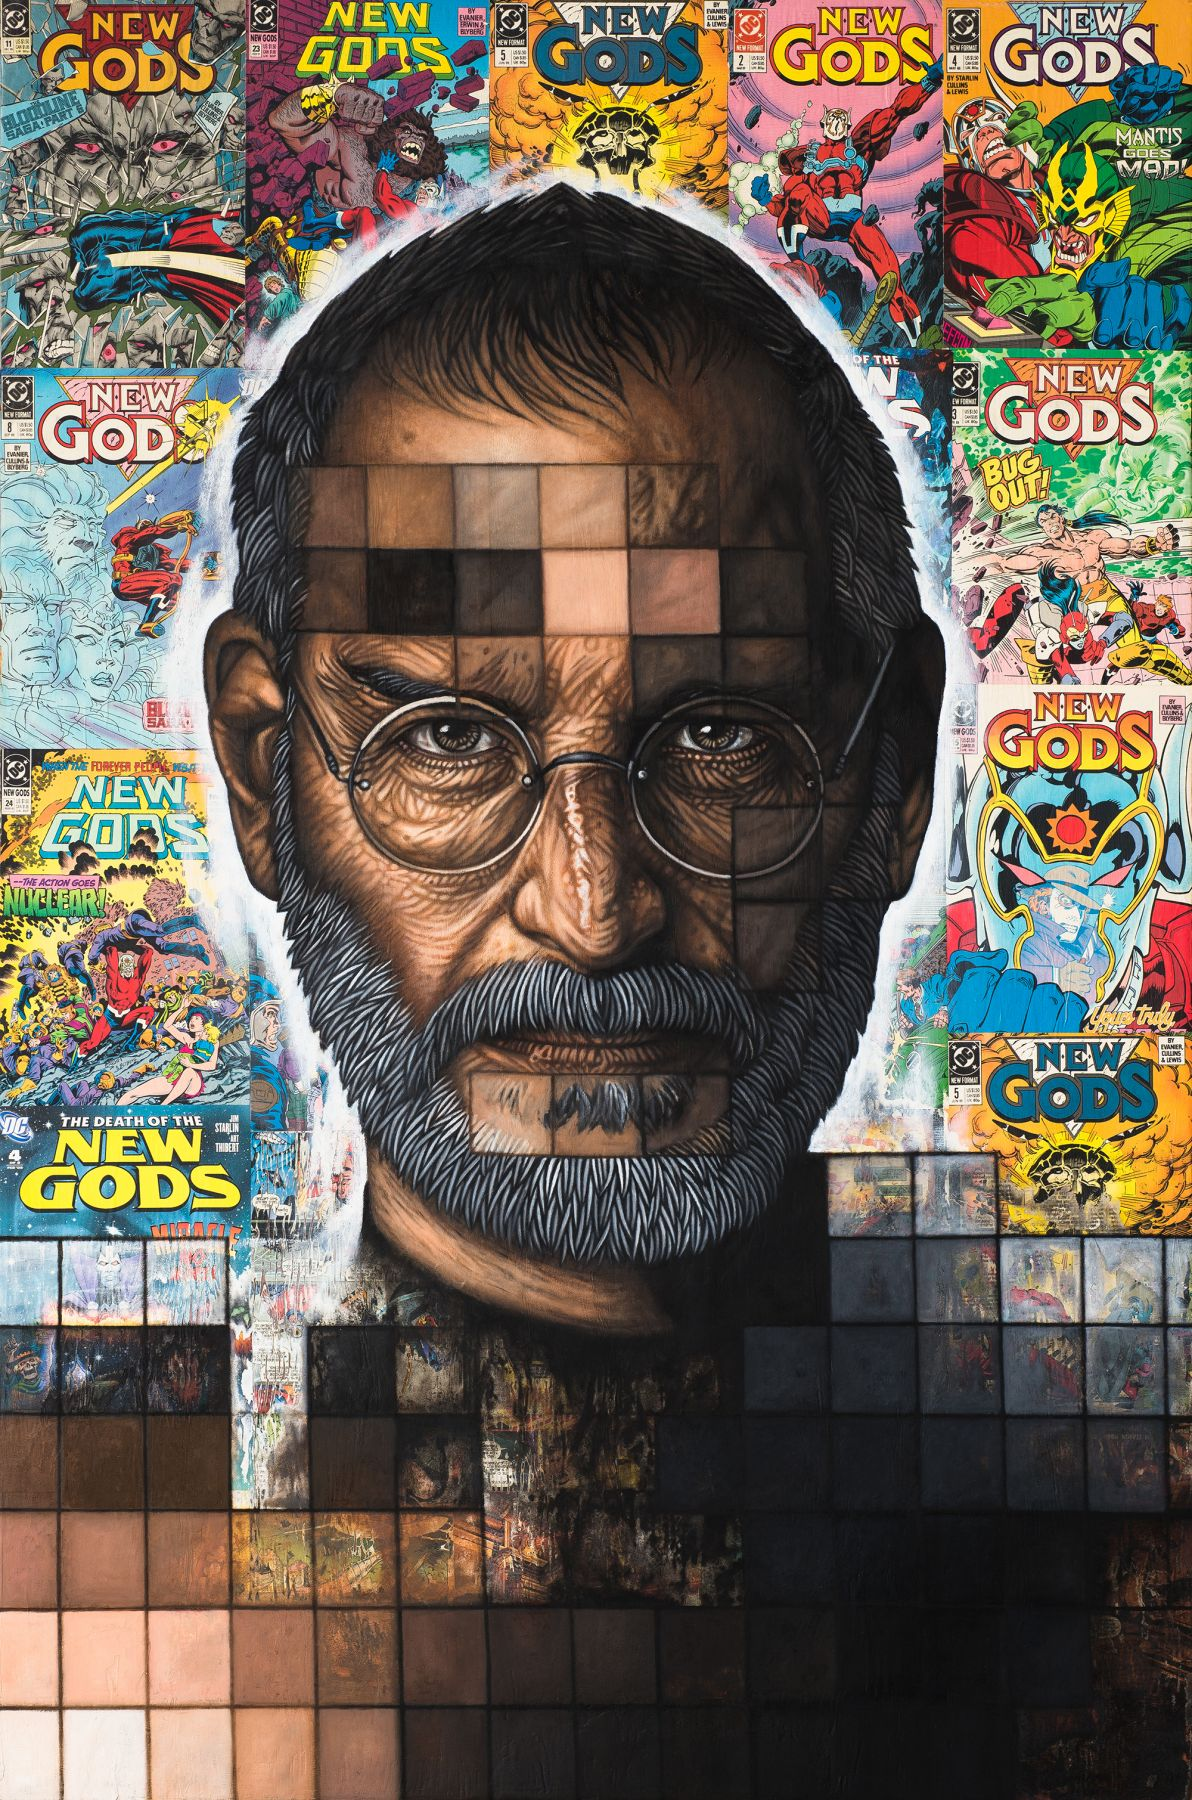 New Gods (Jobs) by Michael LaBua